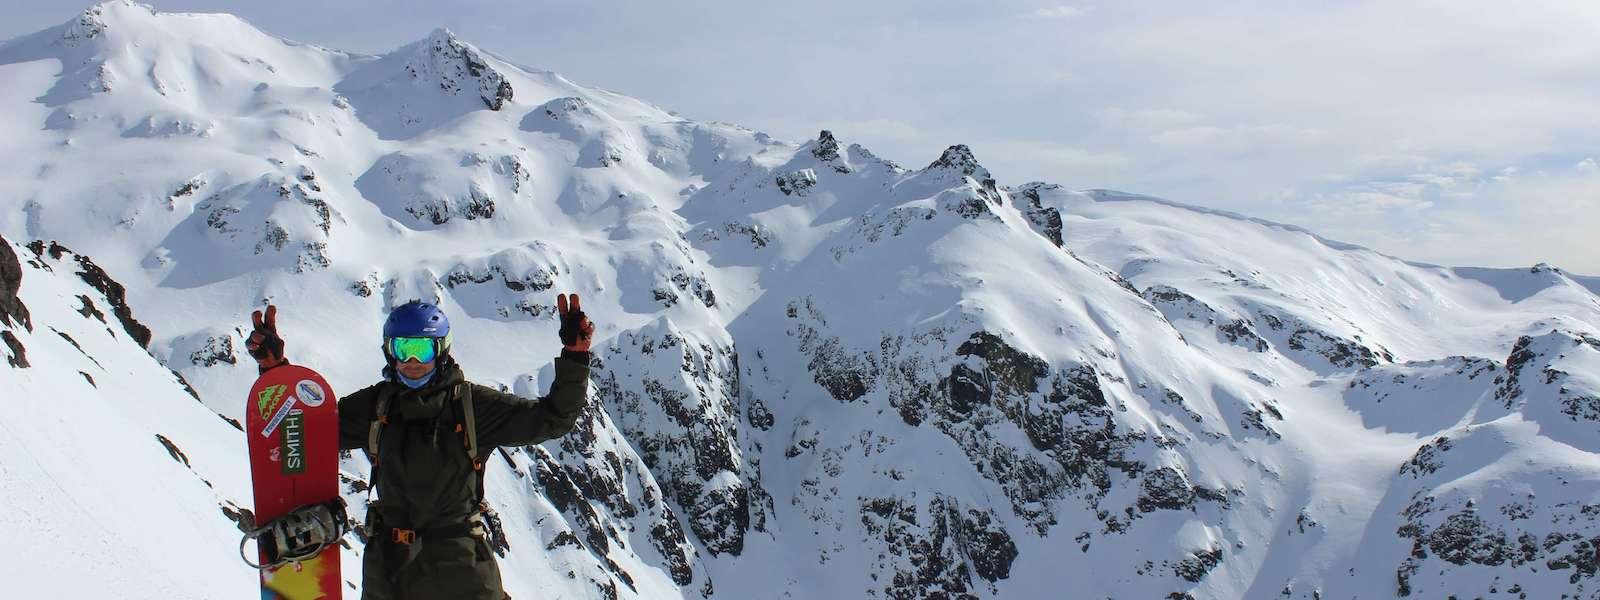 snowboarding argentina